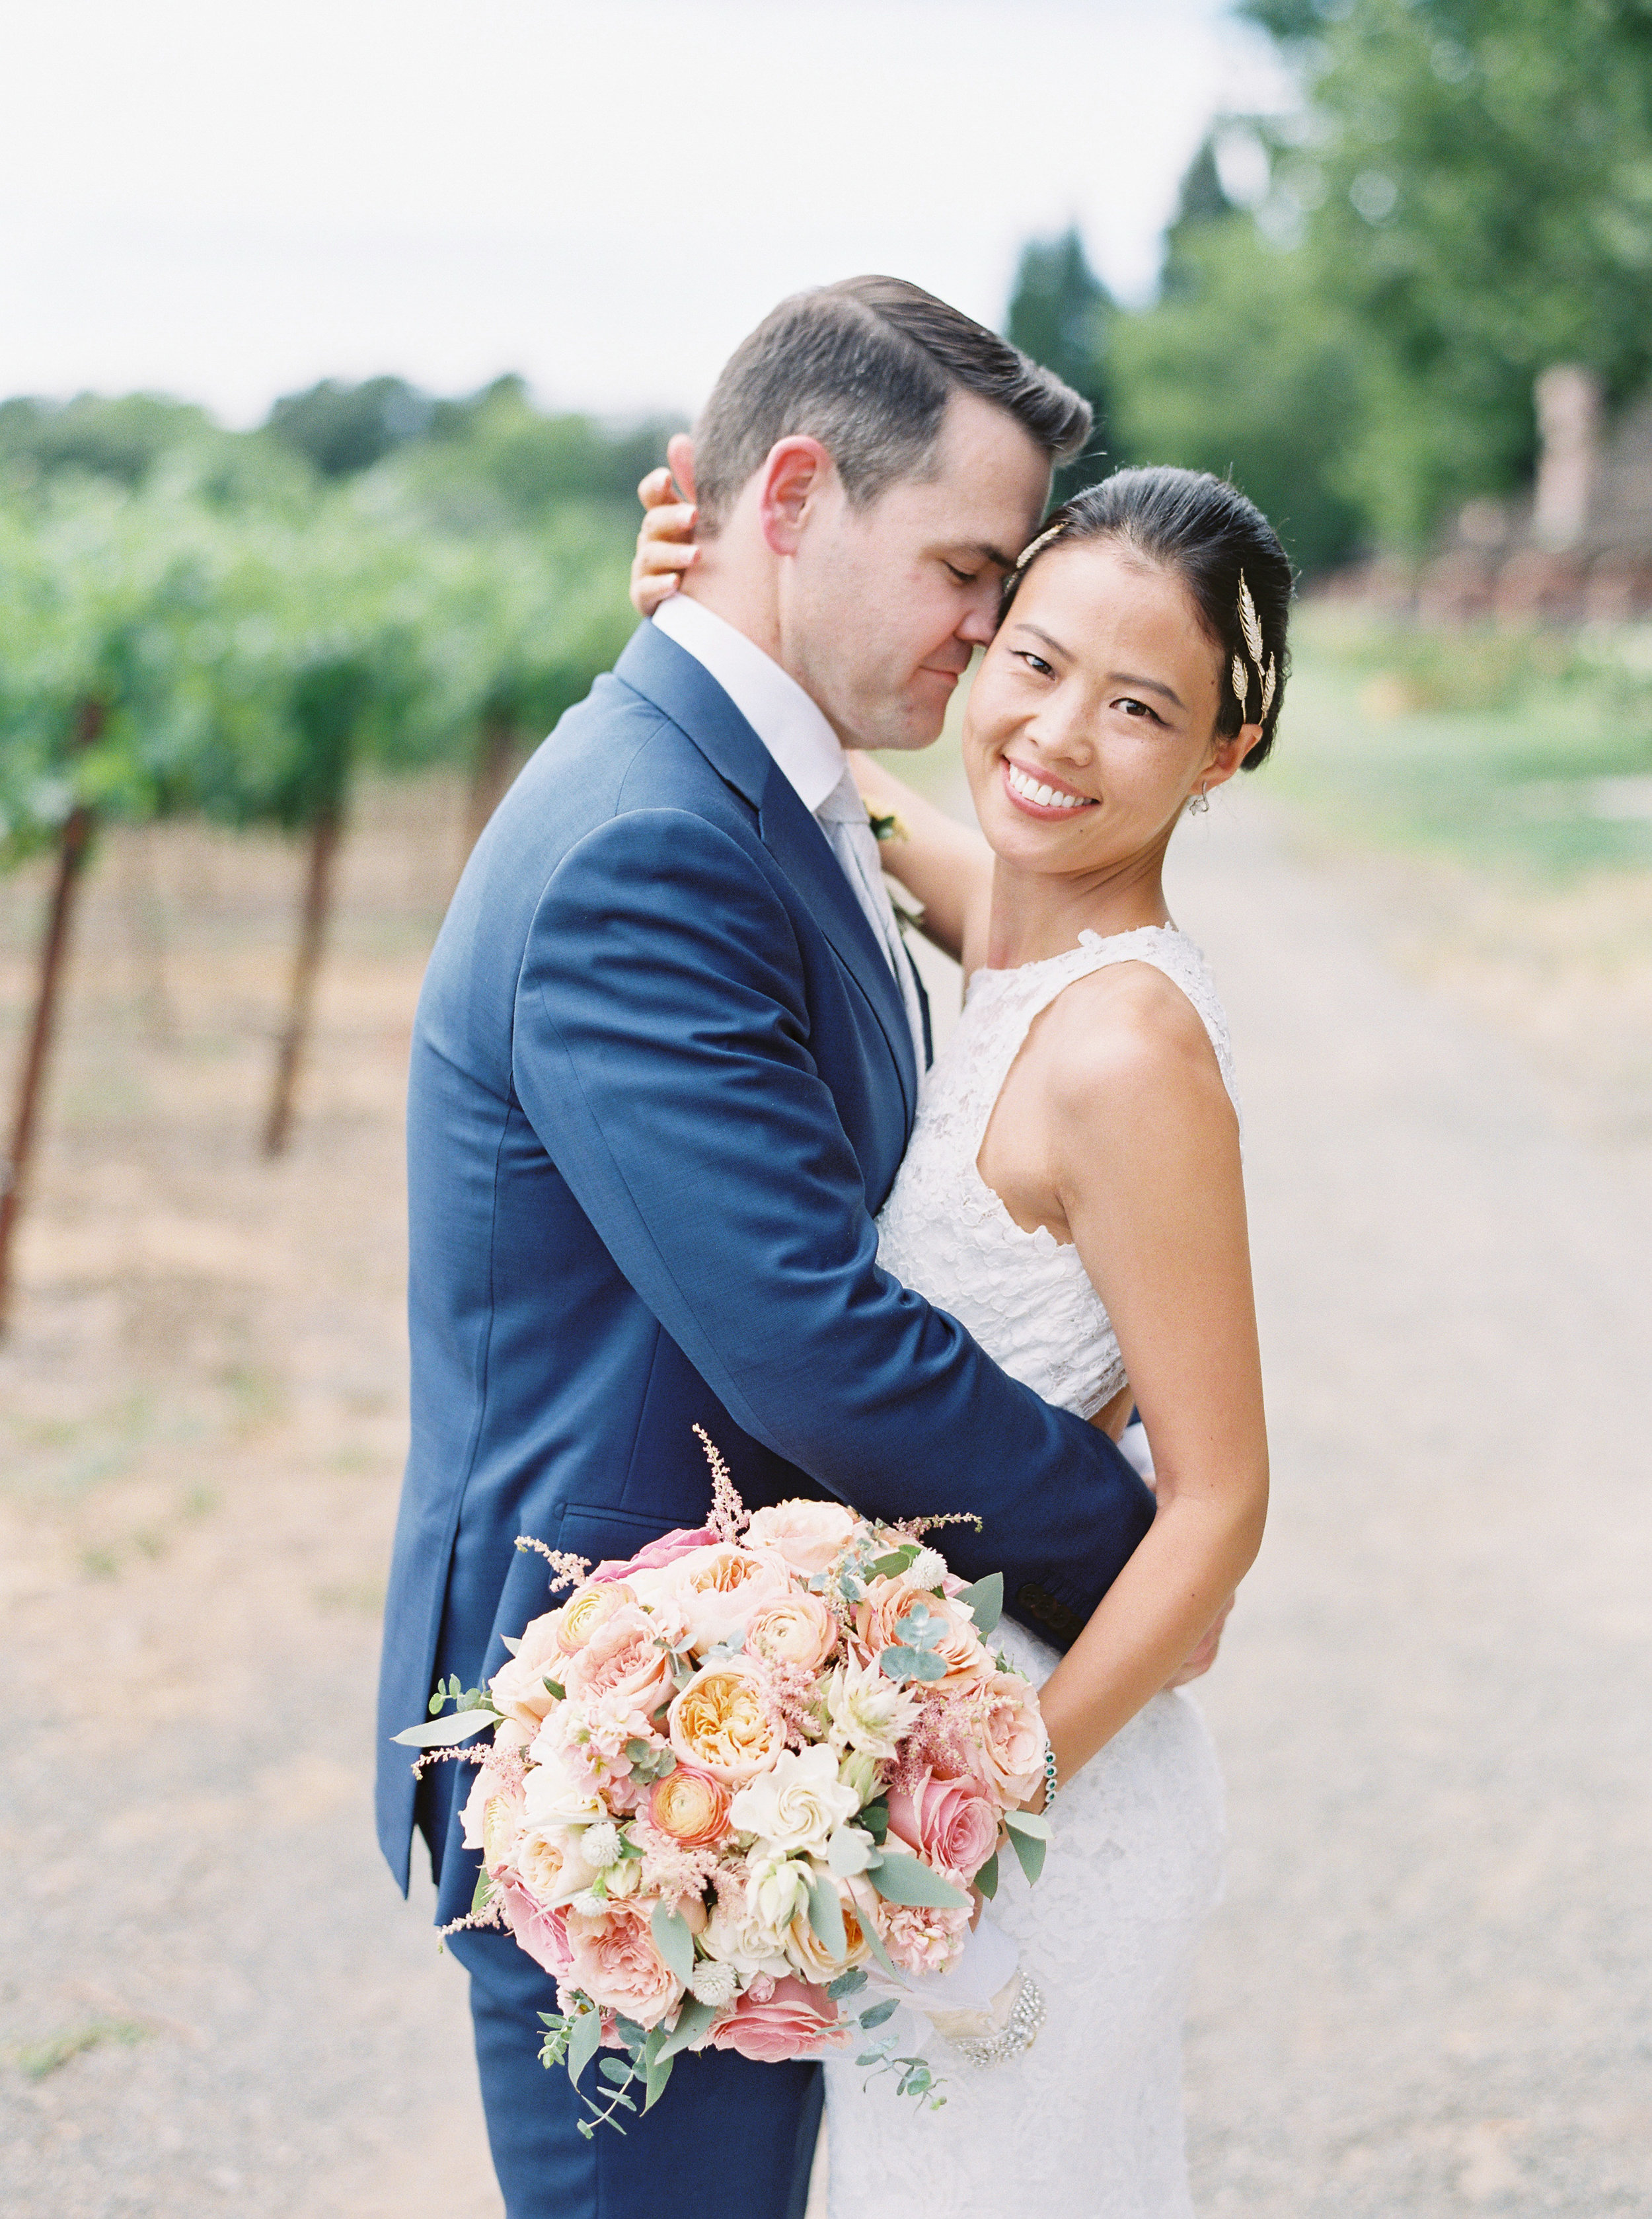 Harvest-inn-wedding-in-napa-california-155.jpg